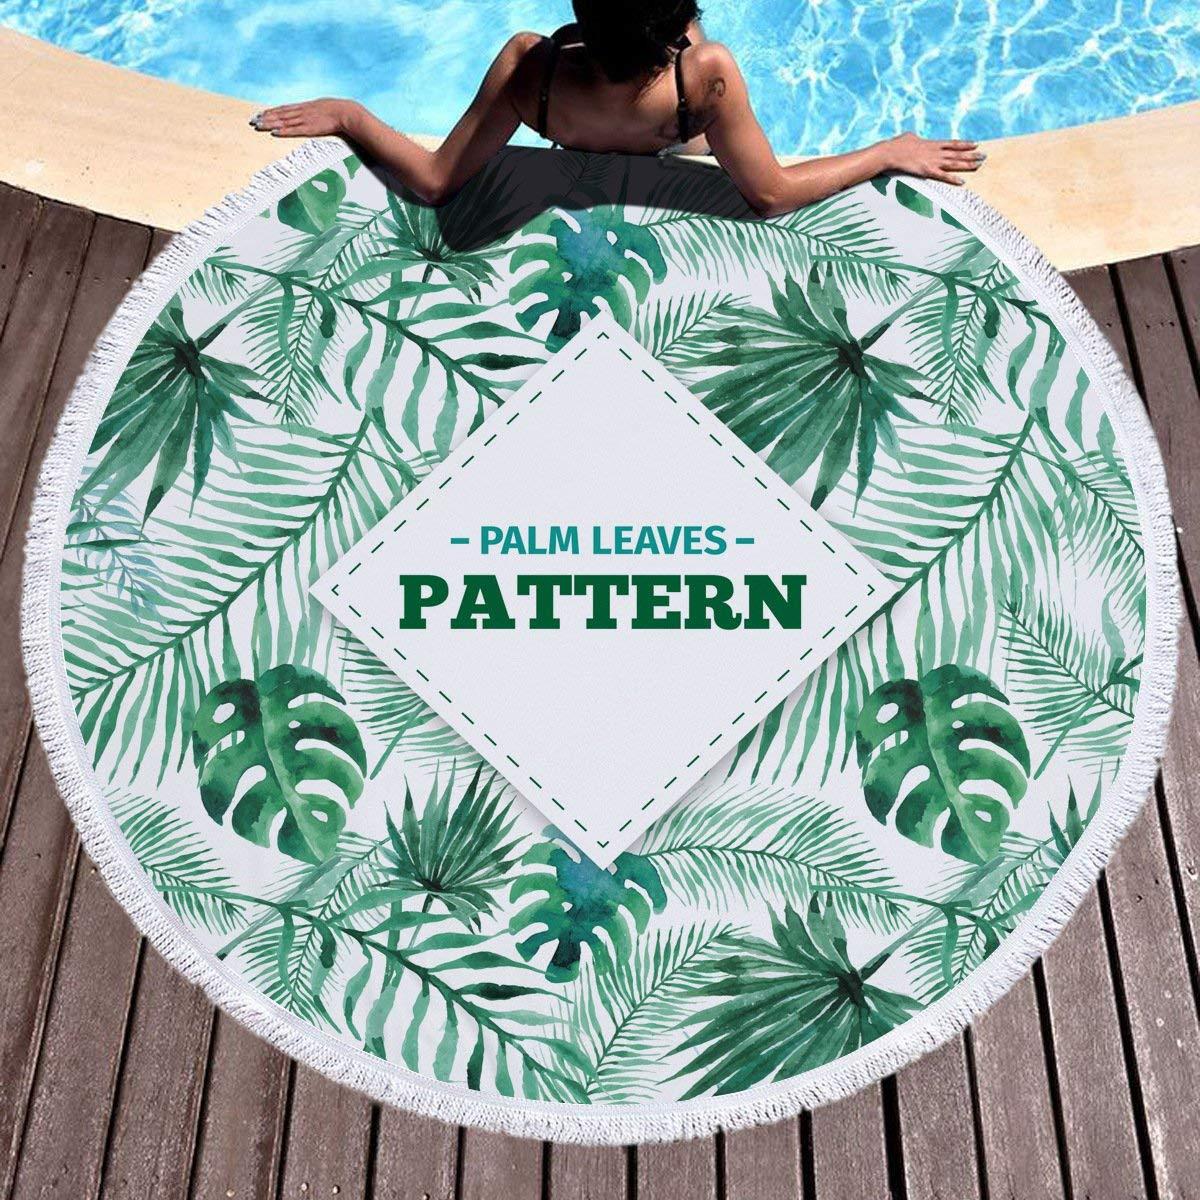 A Beach Towel Round Beach Towel Fringed Beach Towel Swimming Shawl Outdoor Carpet Picnic Mat Beach Sunscreen Towel Yoga Mat. B for Kids & Adults